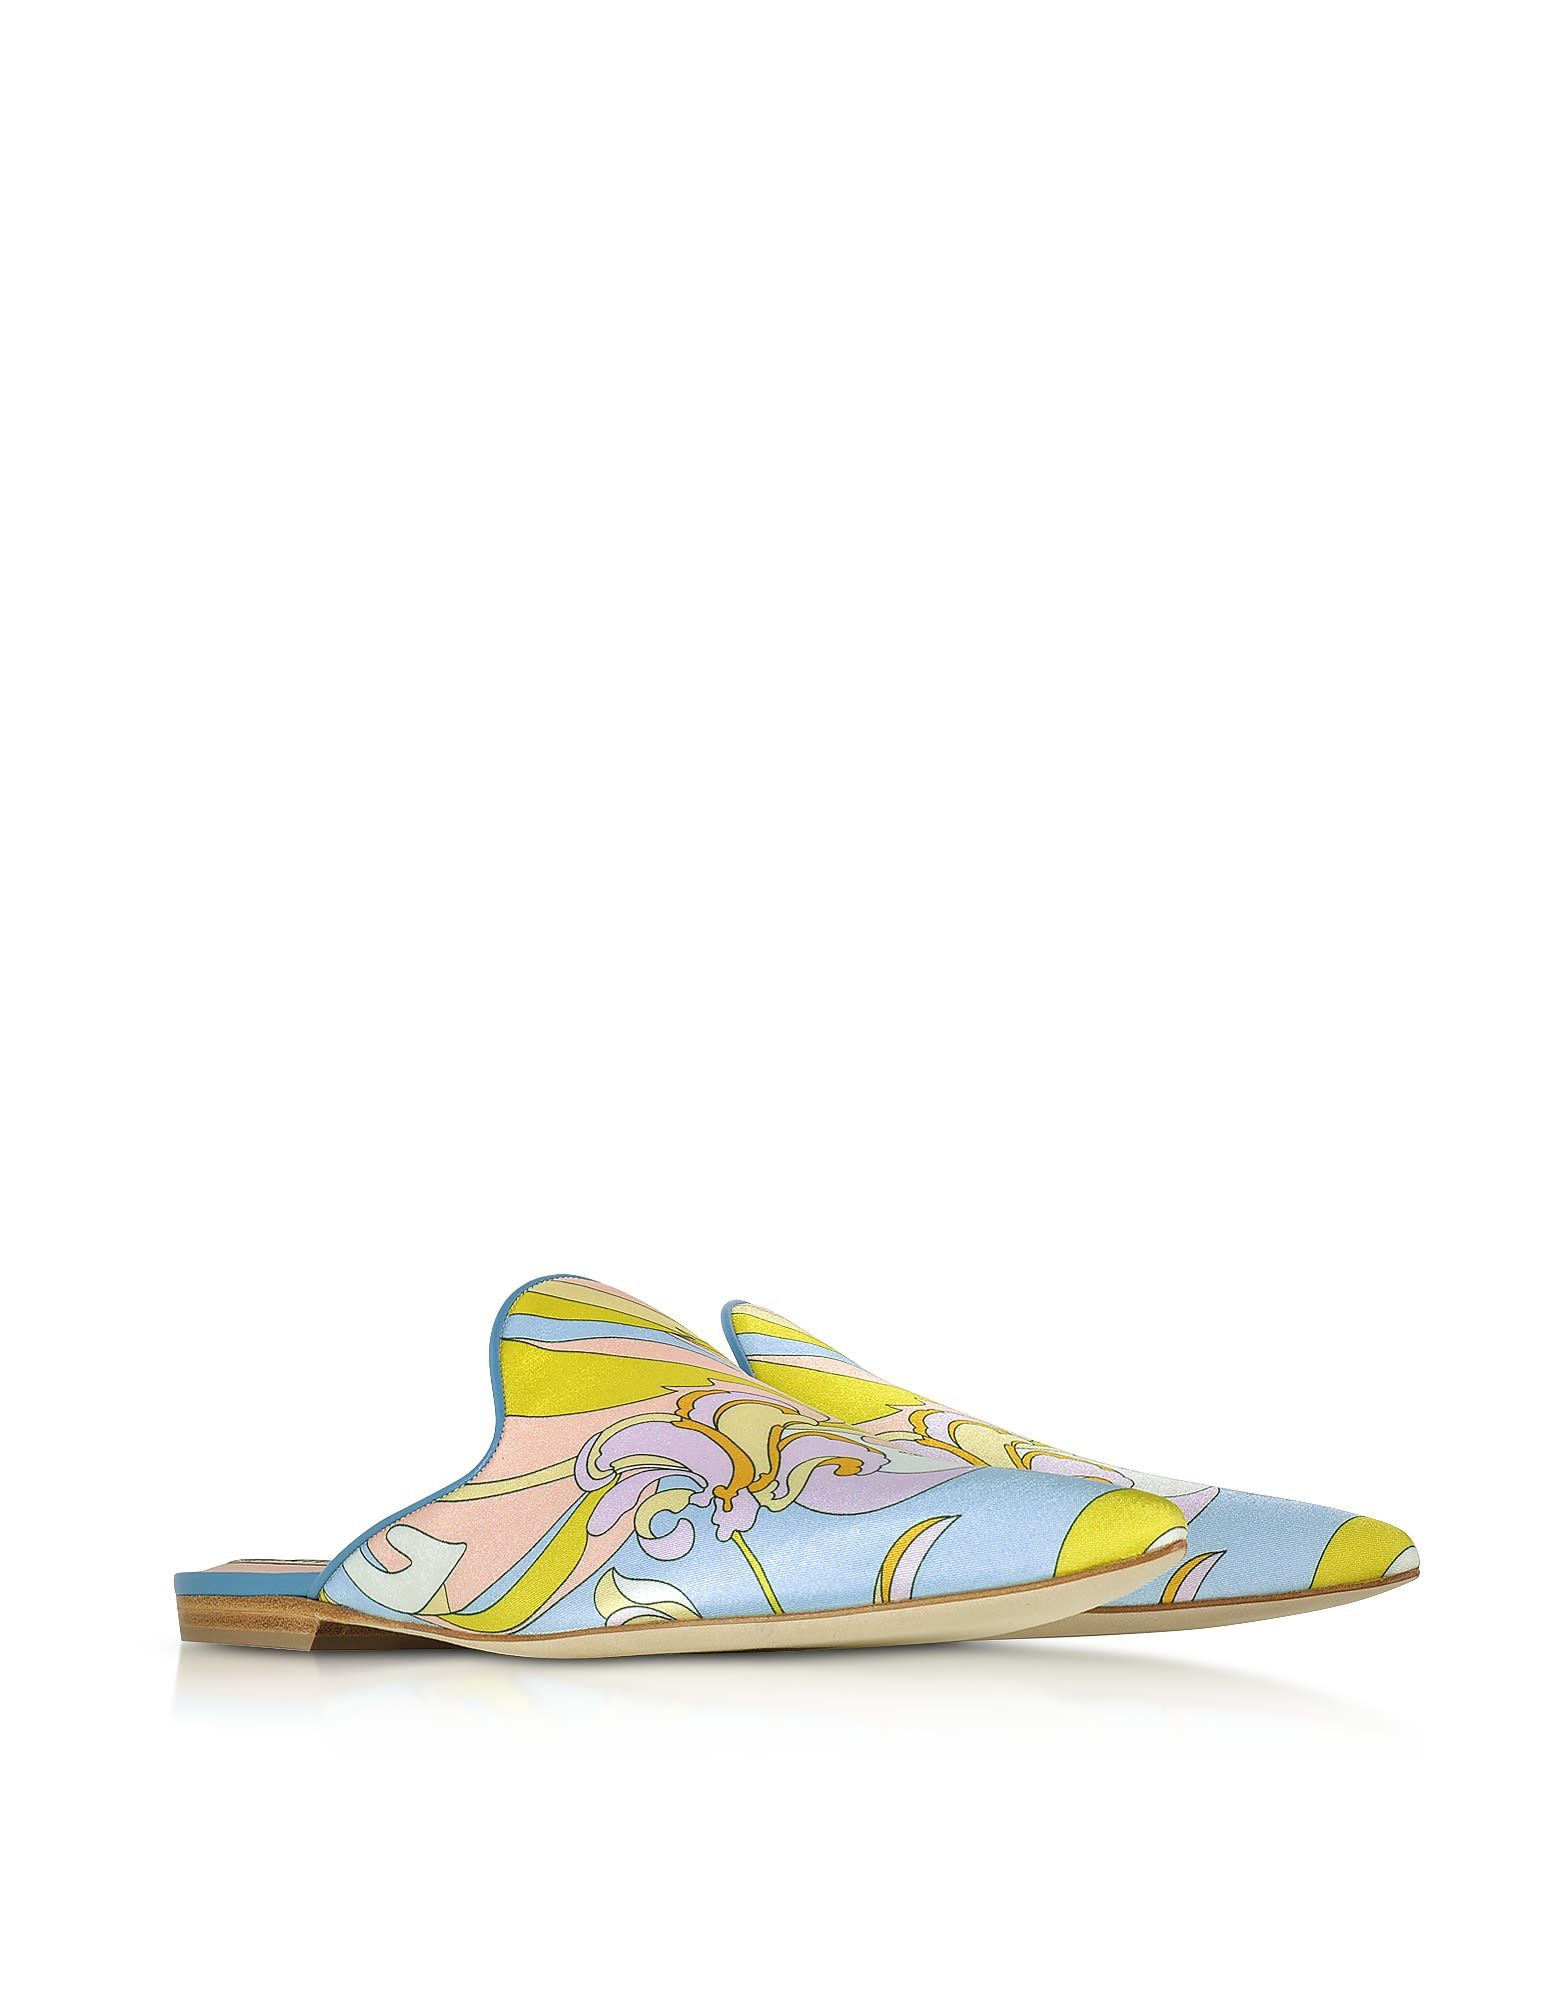 Emilio Pucci Designer Shoes, Lemon Satin Printed Flat Mules